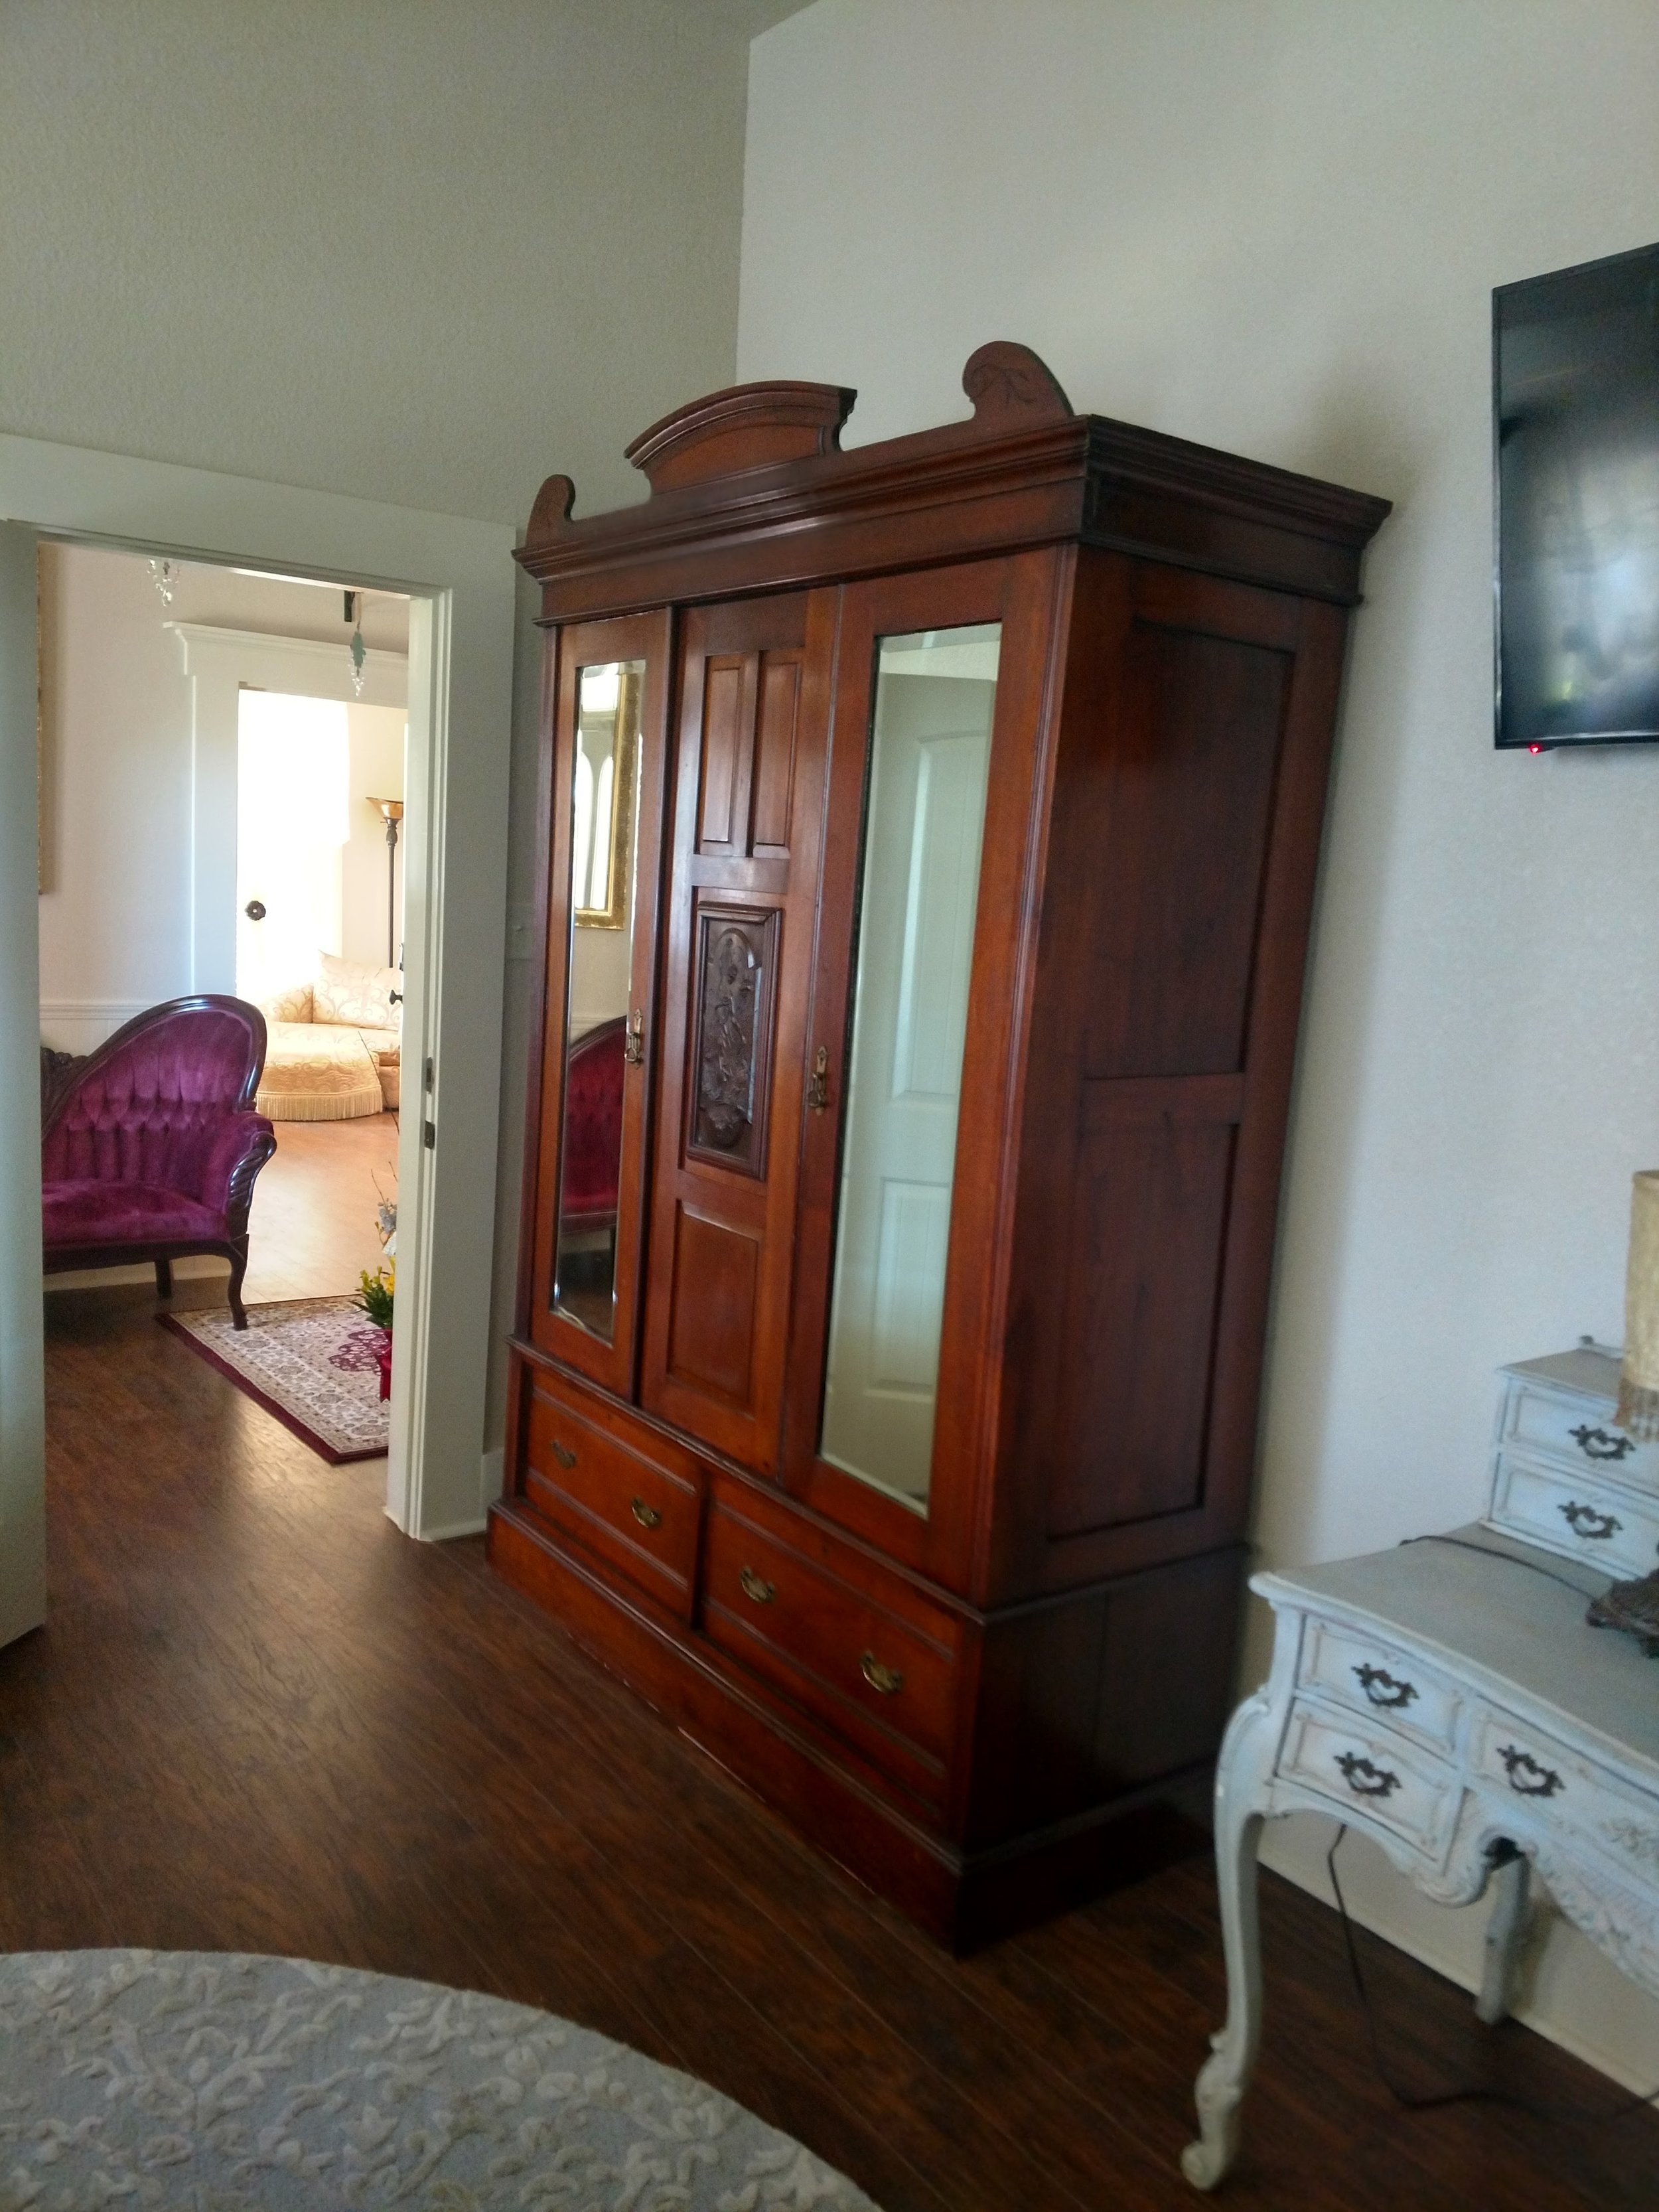 Big House_Hutch King Alex room.jpg